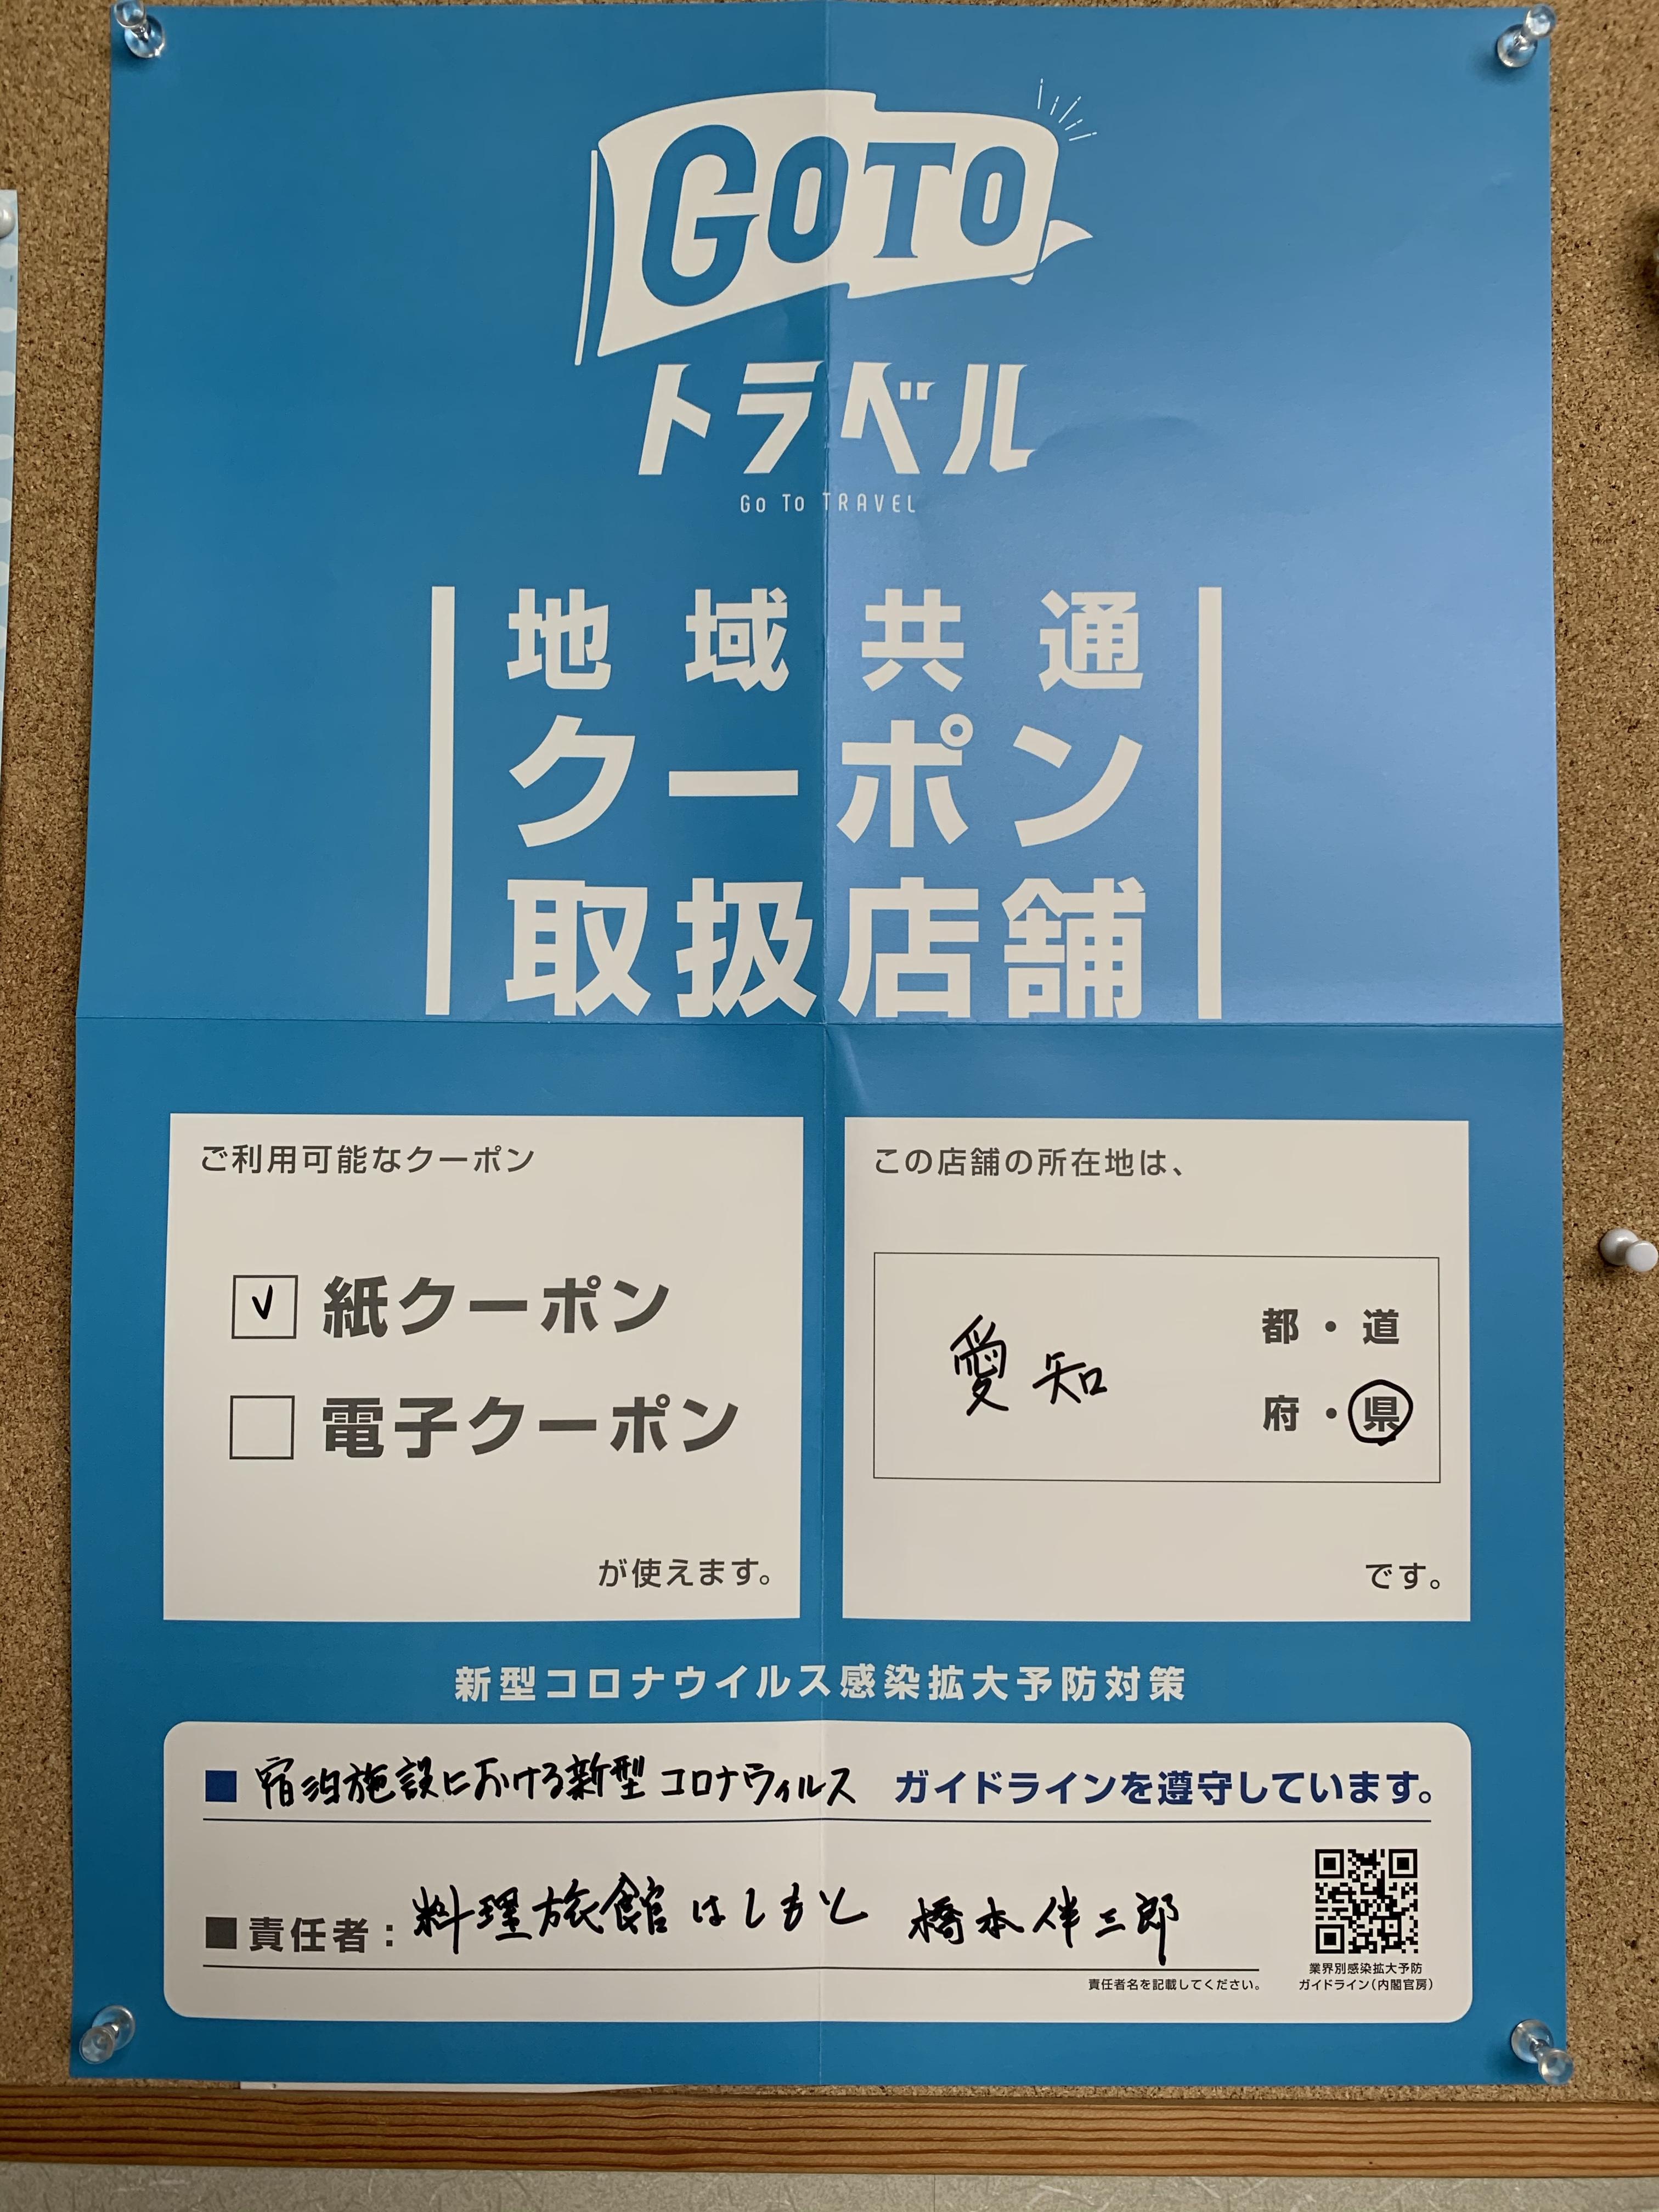 Goto トラベル 地域 共通 クーポン 使える 店